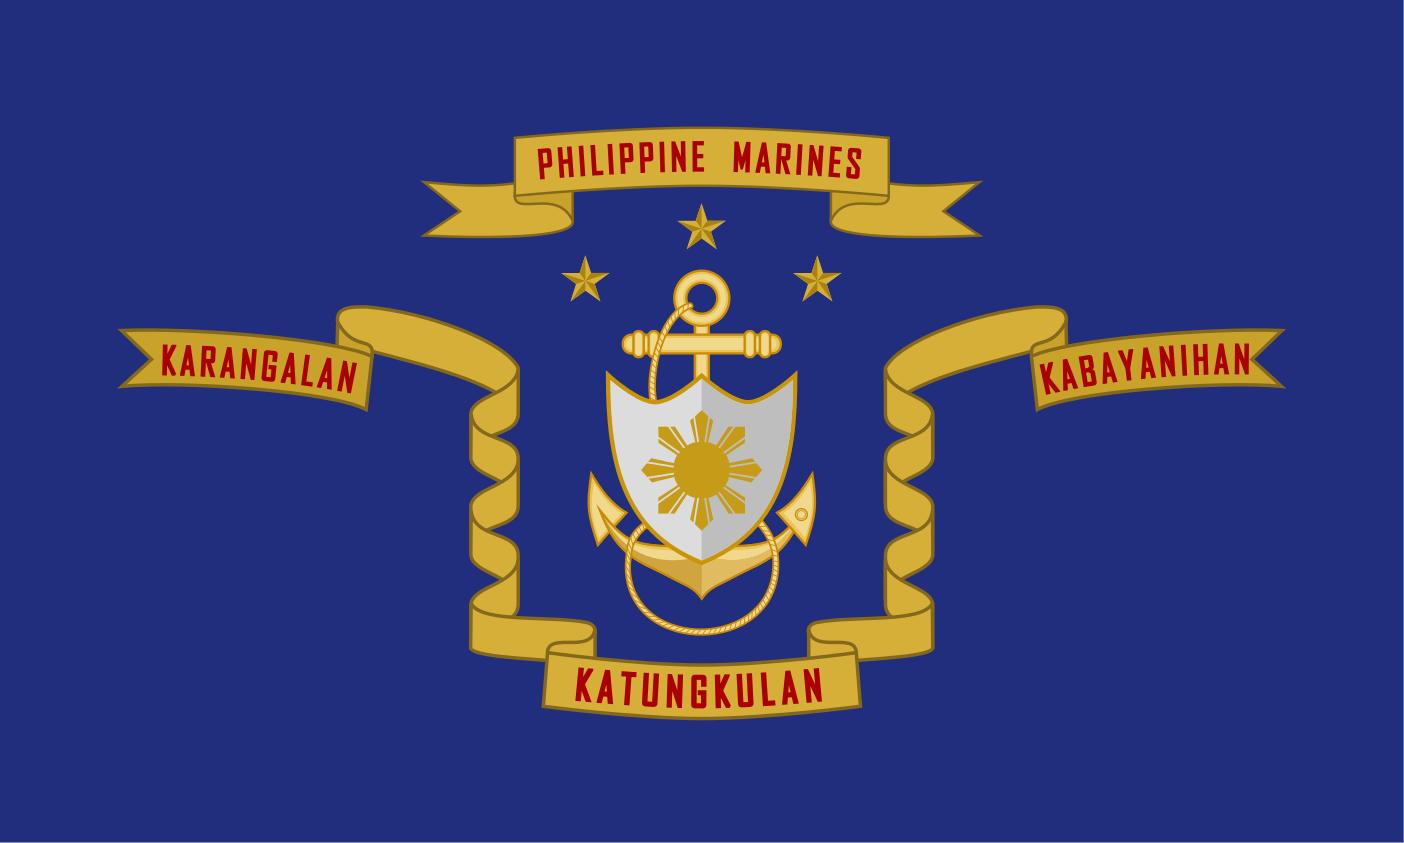 Fileflag of the philippine marine corpsg wikimedia commons fileflag of the philippine marine corpsg biocorpaavc Choice Image